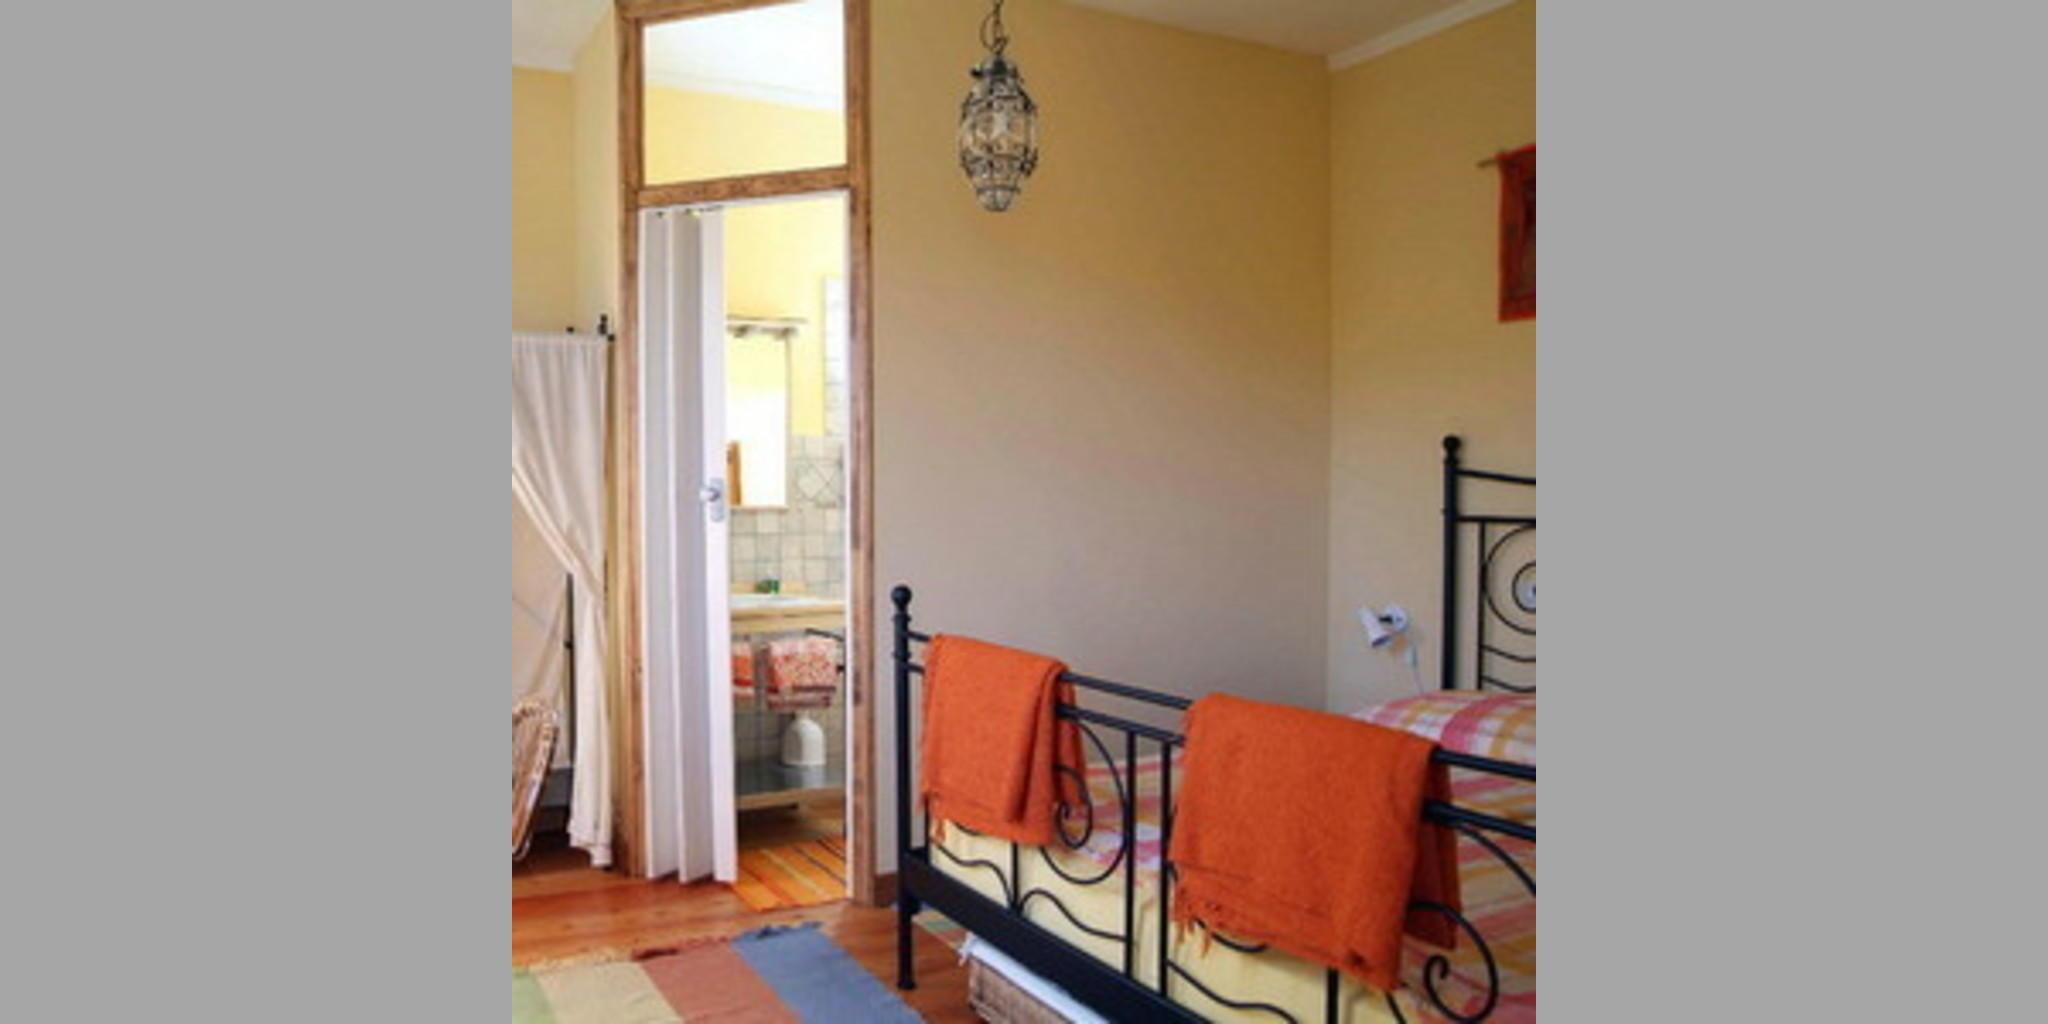 Bed & Breakfast San Biagio Di Callalta - Isoelle